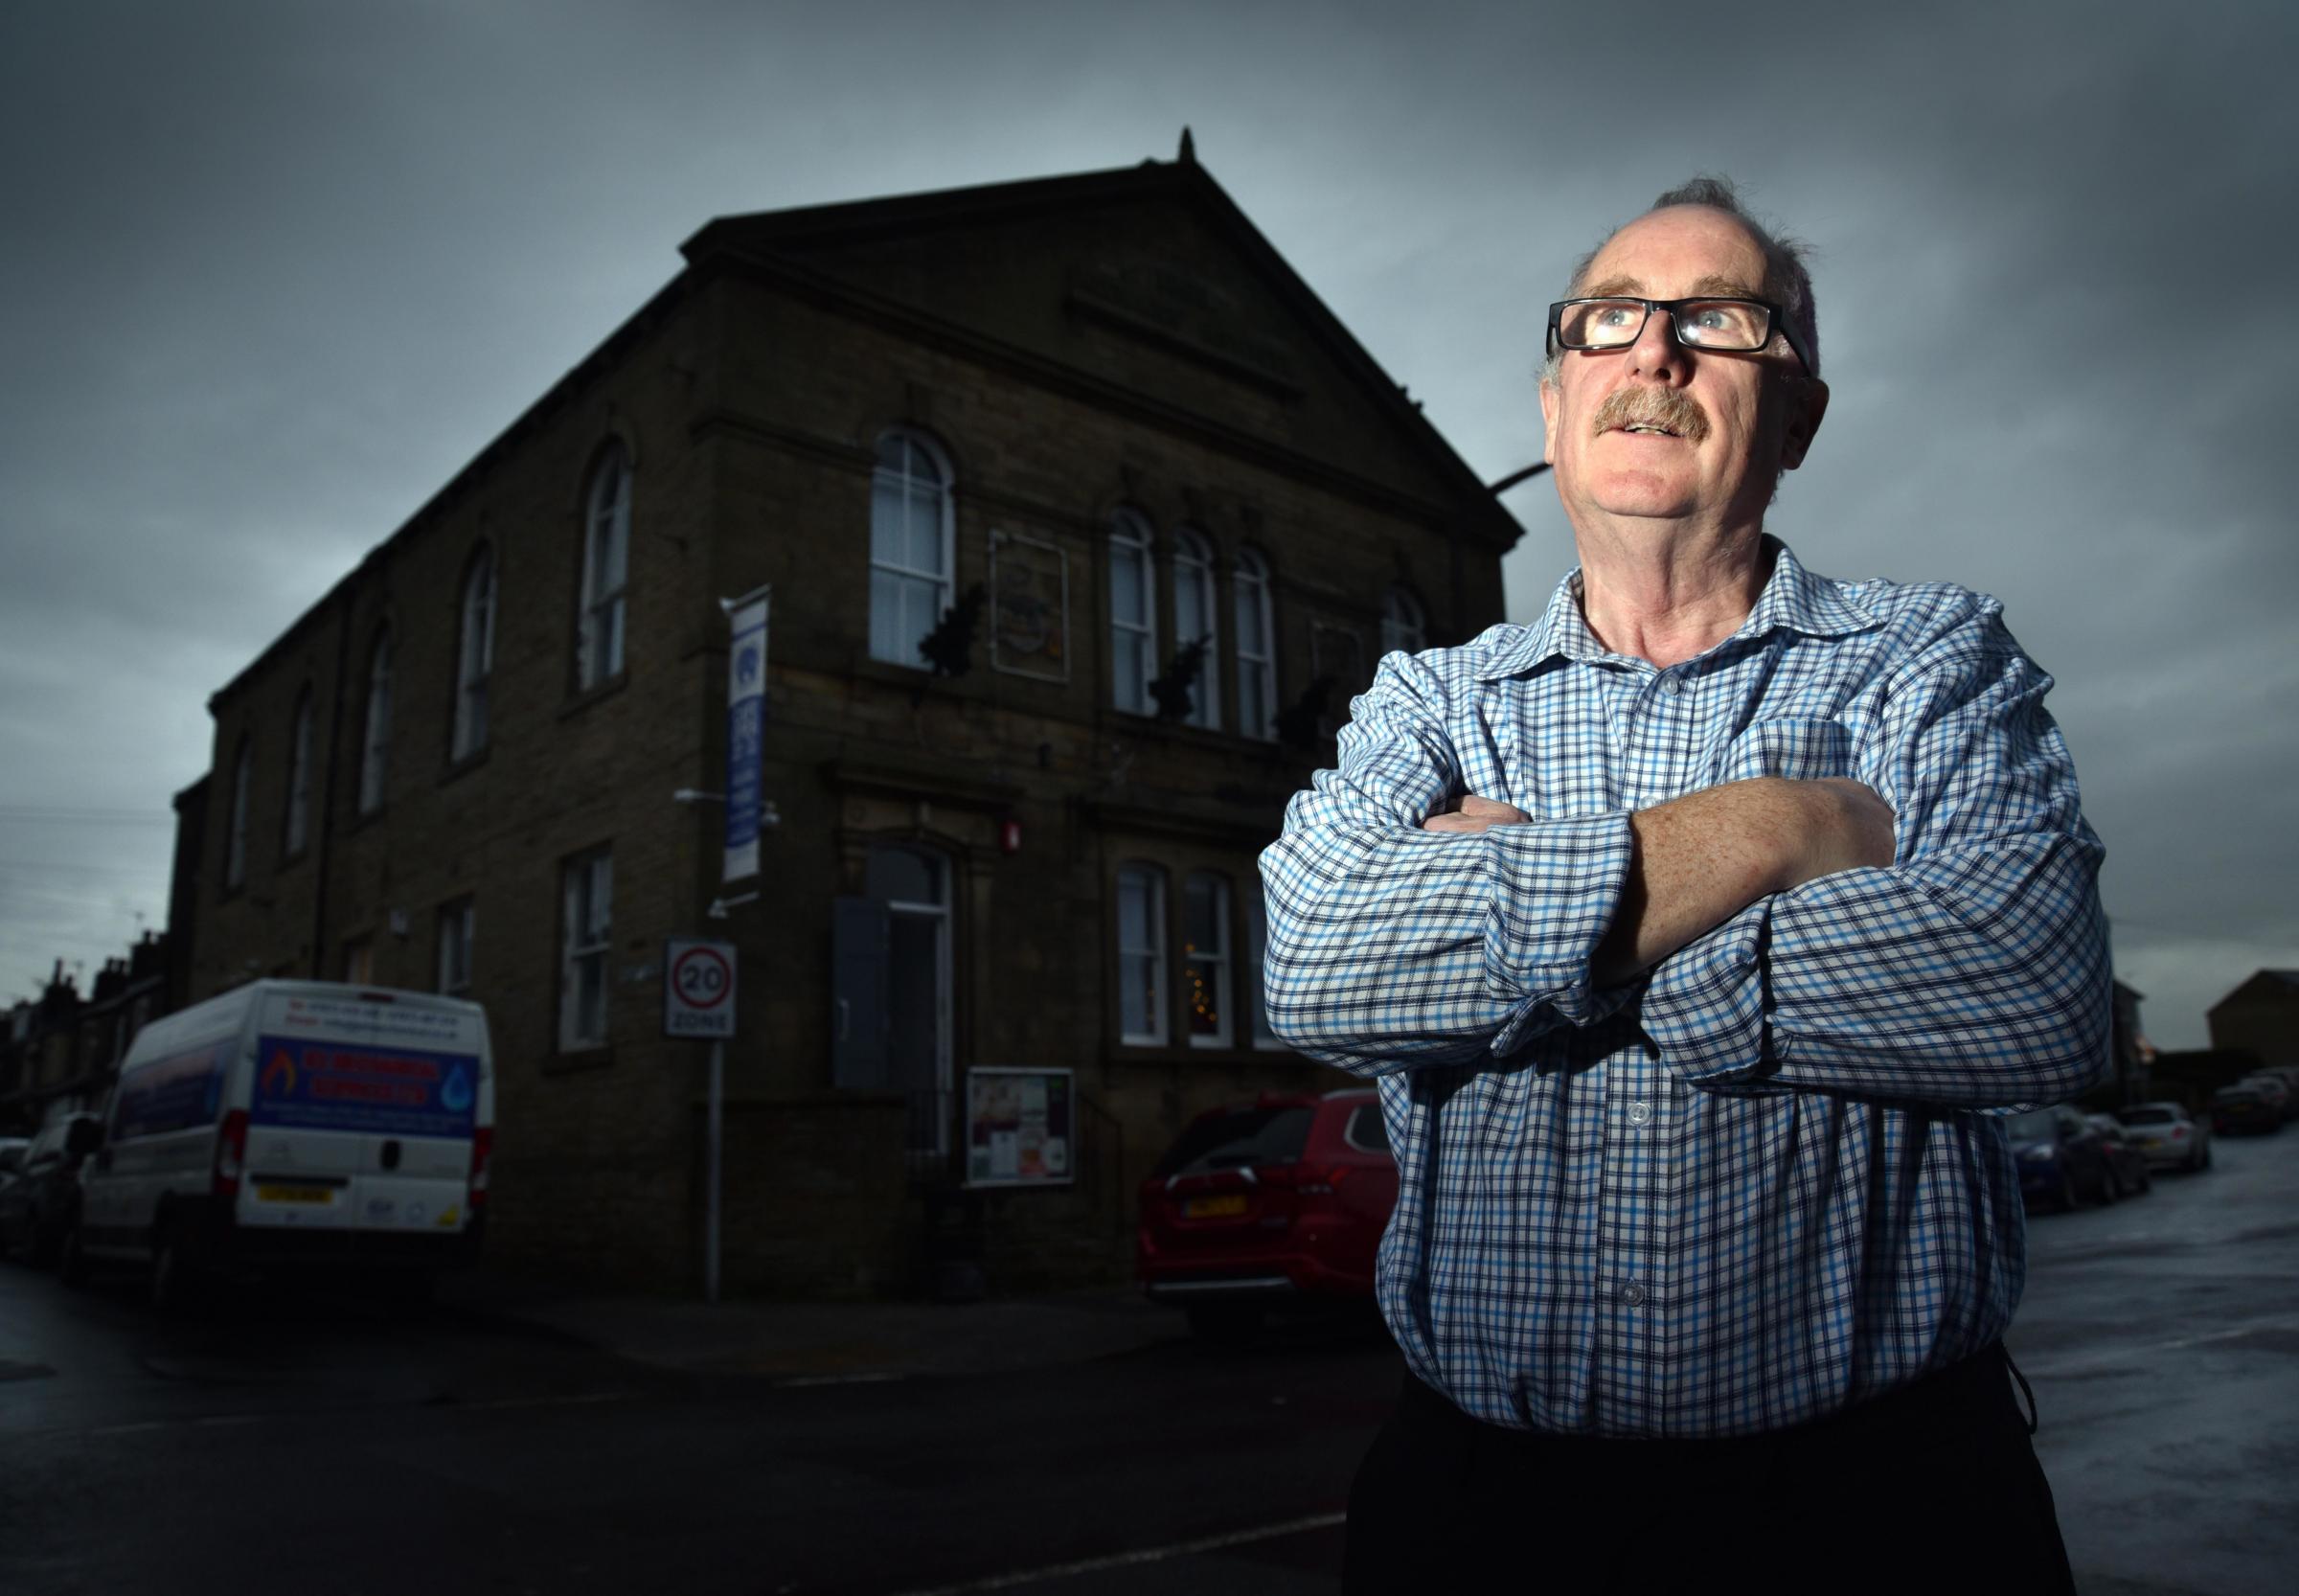 Team of volunteers have transformed Eccleshill Mechanics Institute